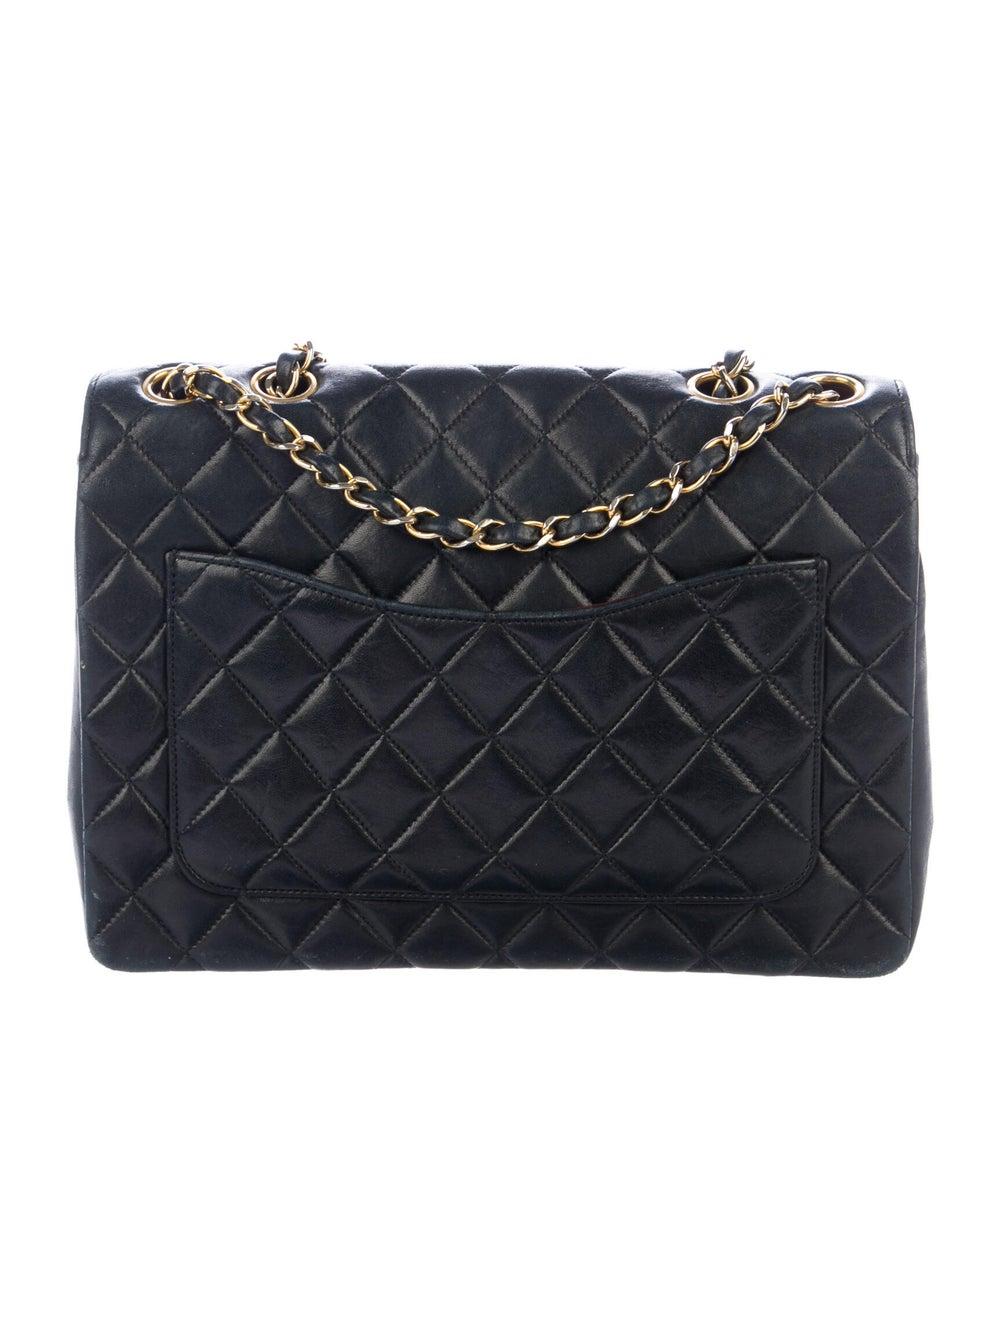 Chanel Vintage Half Moon Flap Bag Blue - image 4